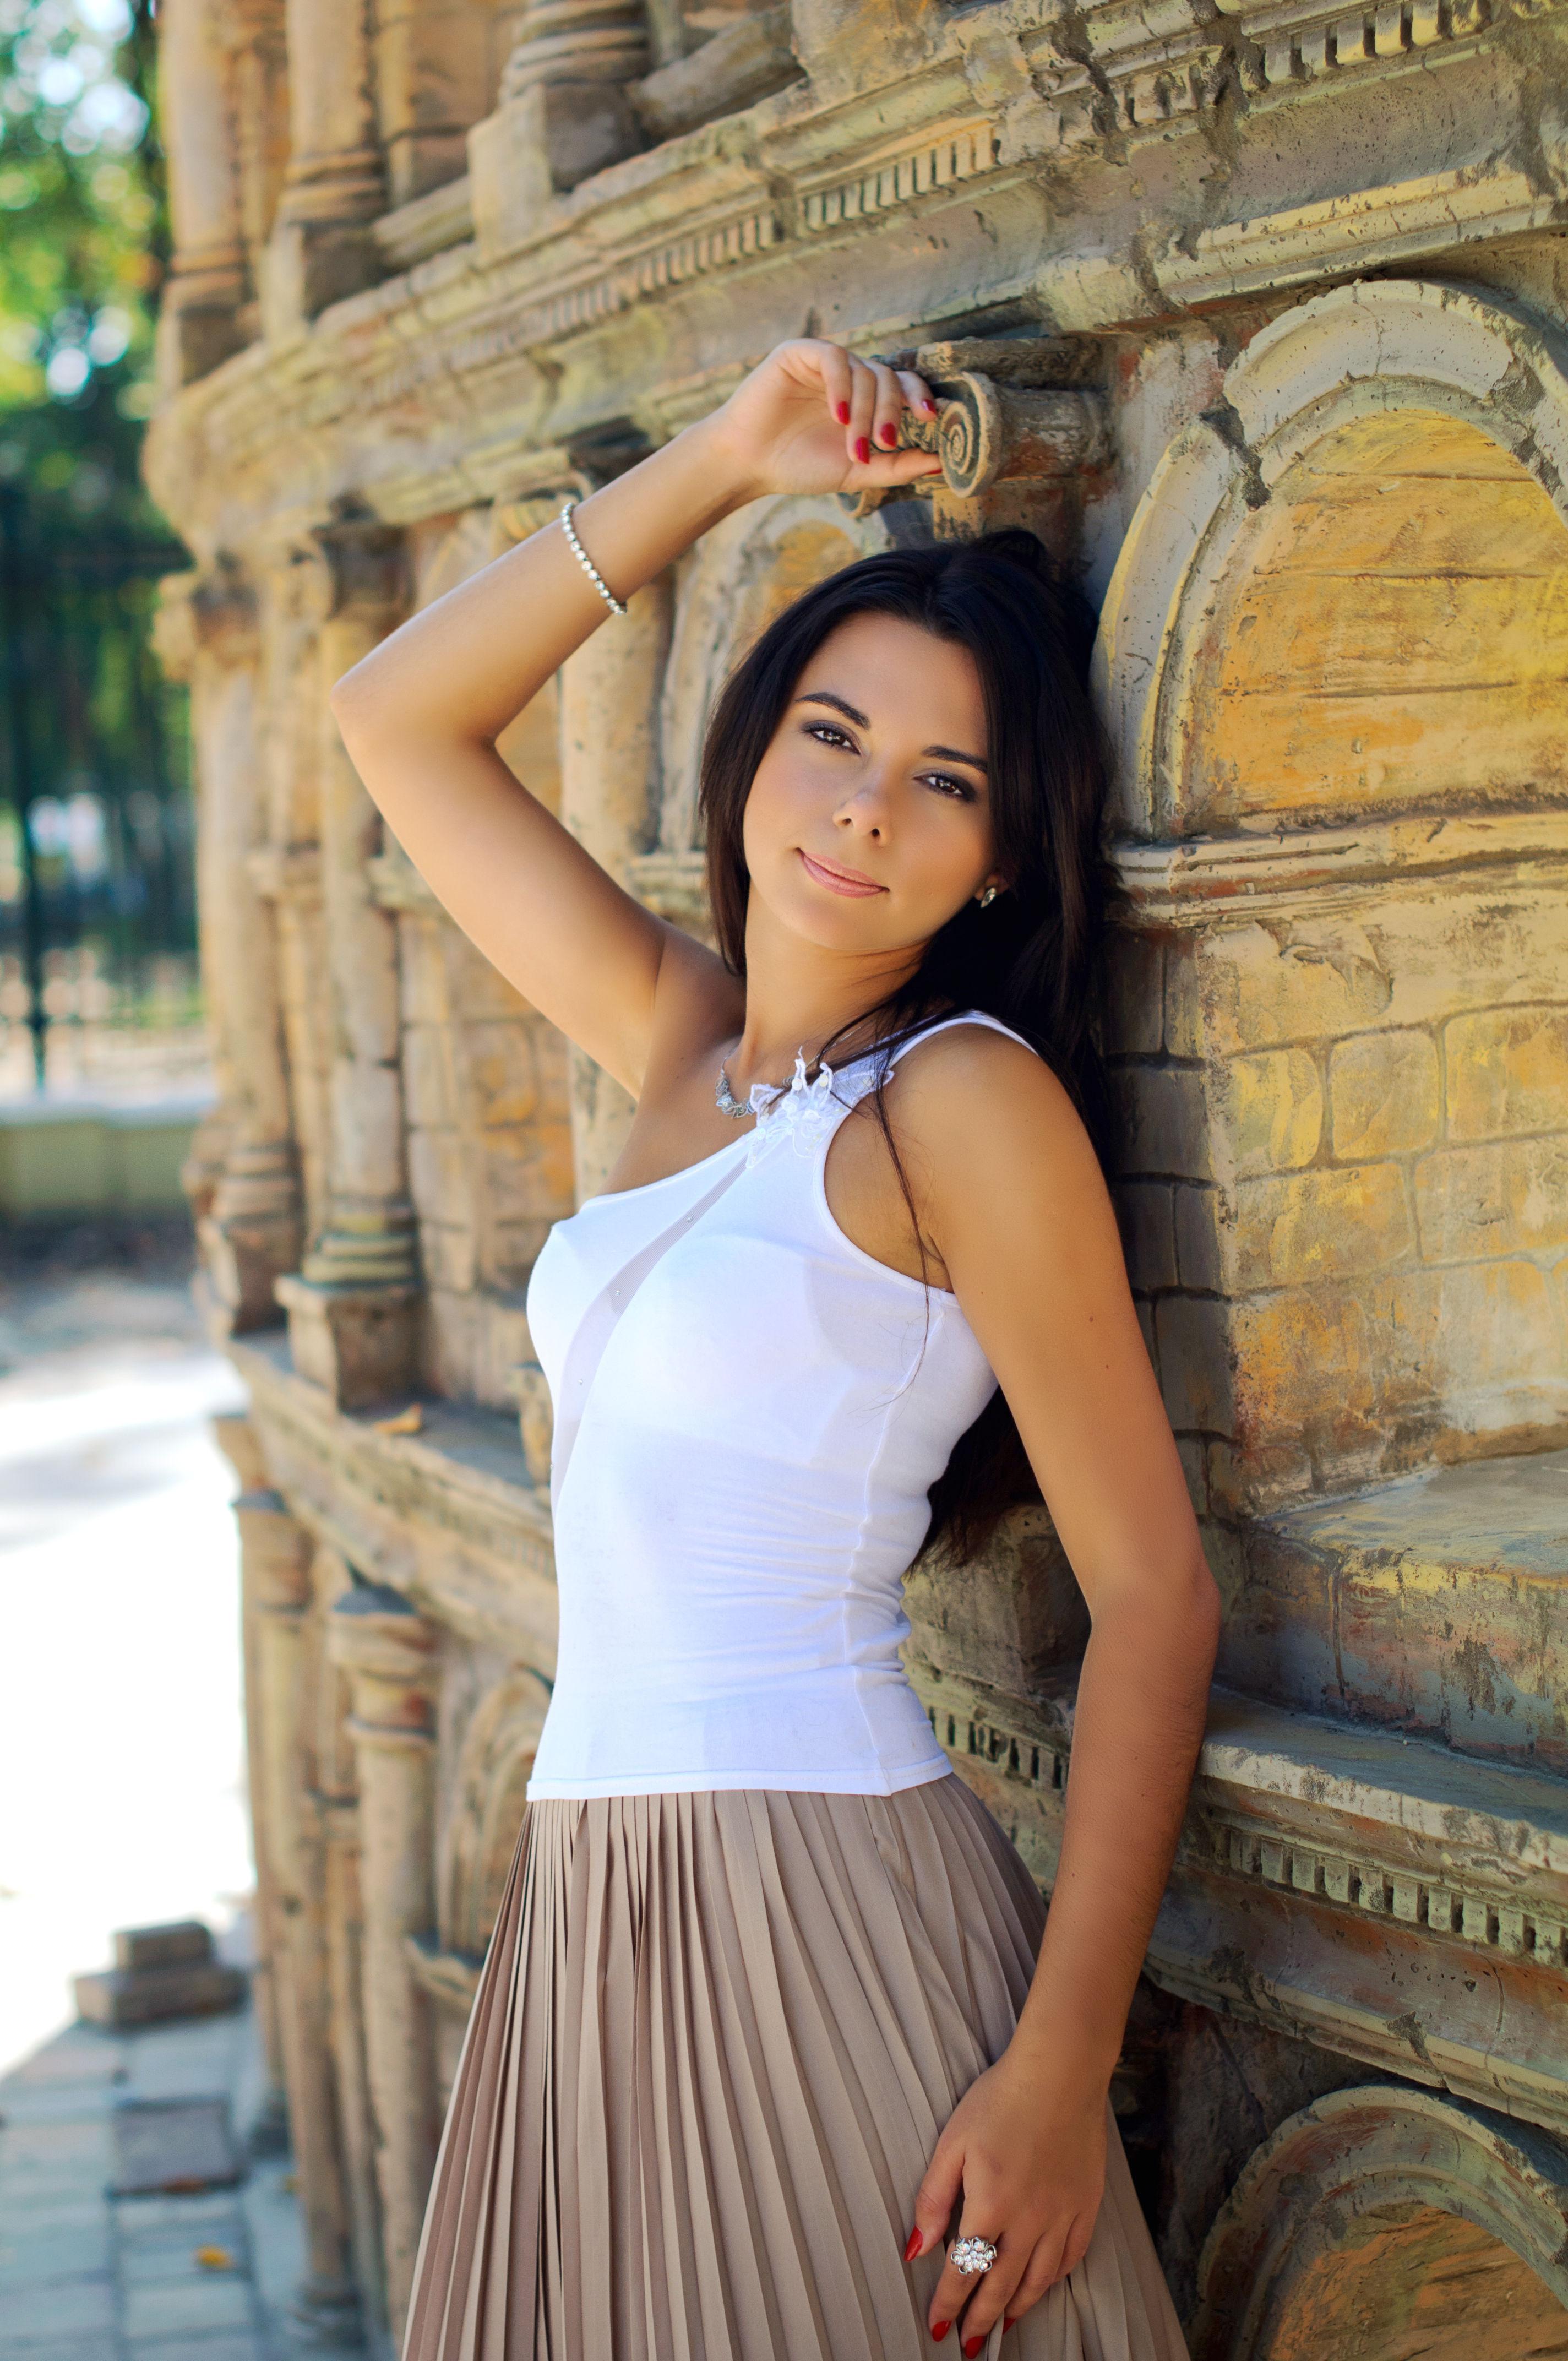 Лена, 20, Харьков